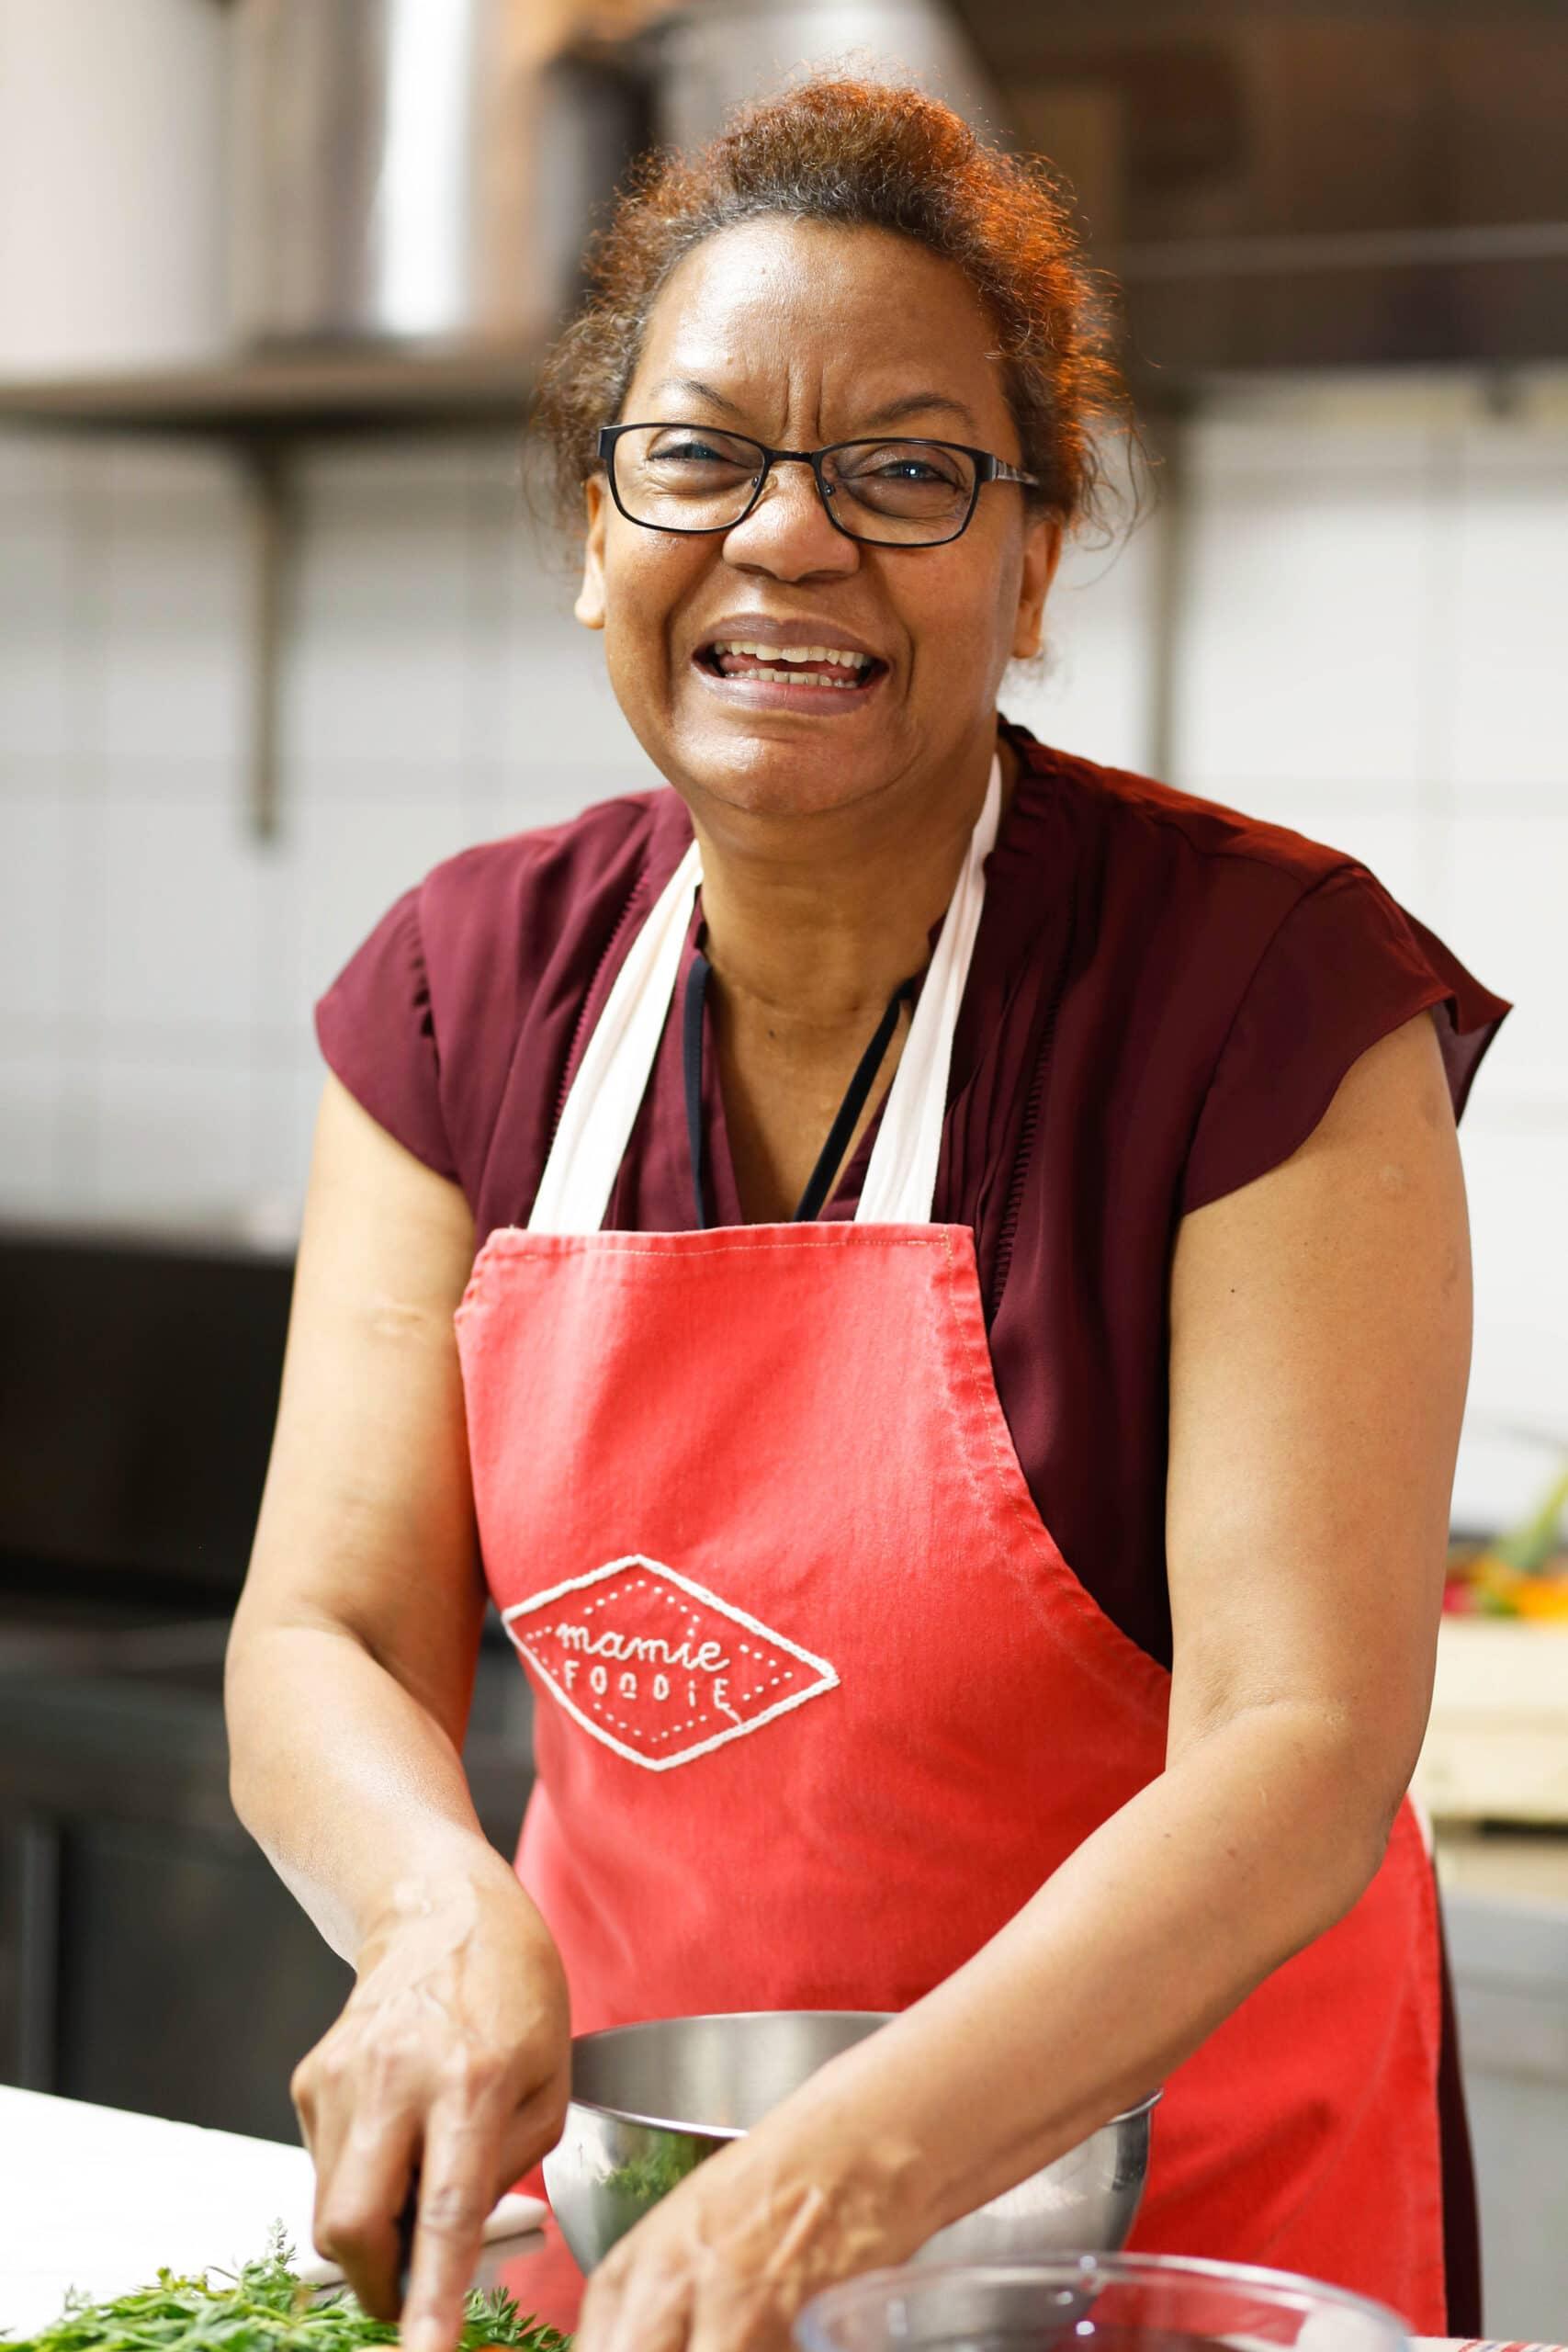 Marie Ange cuisine